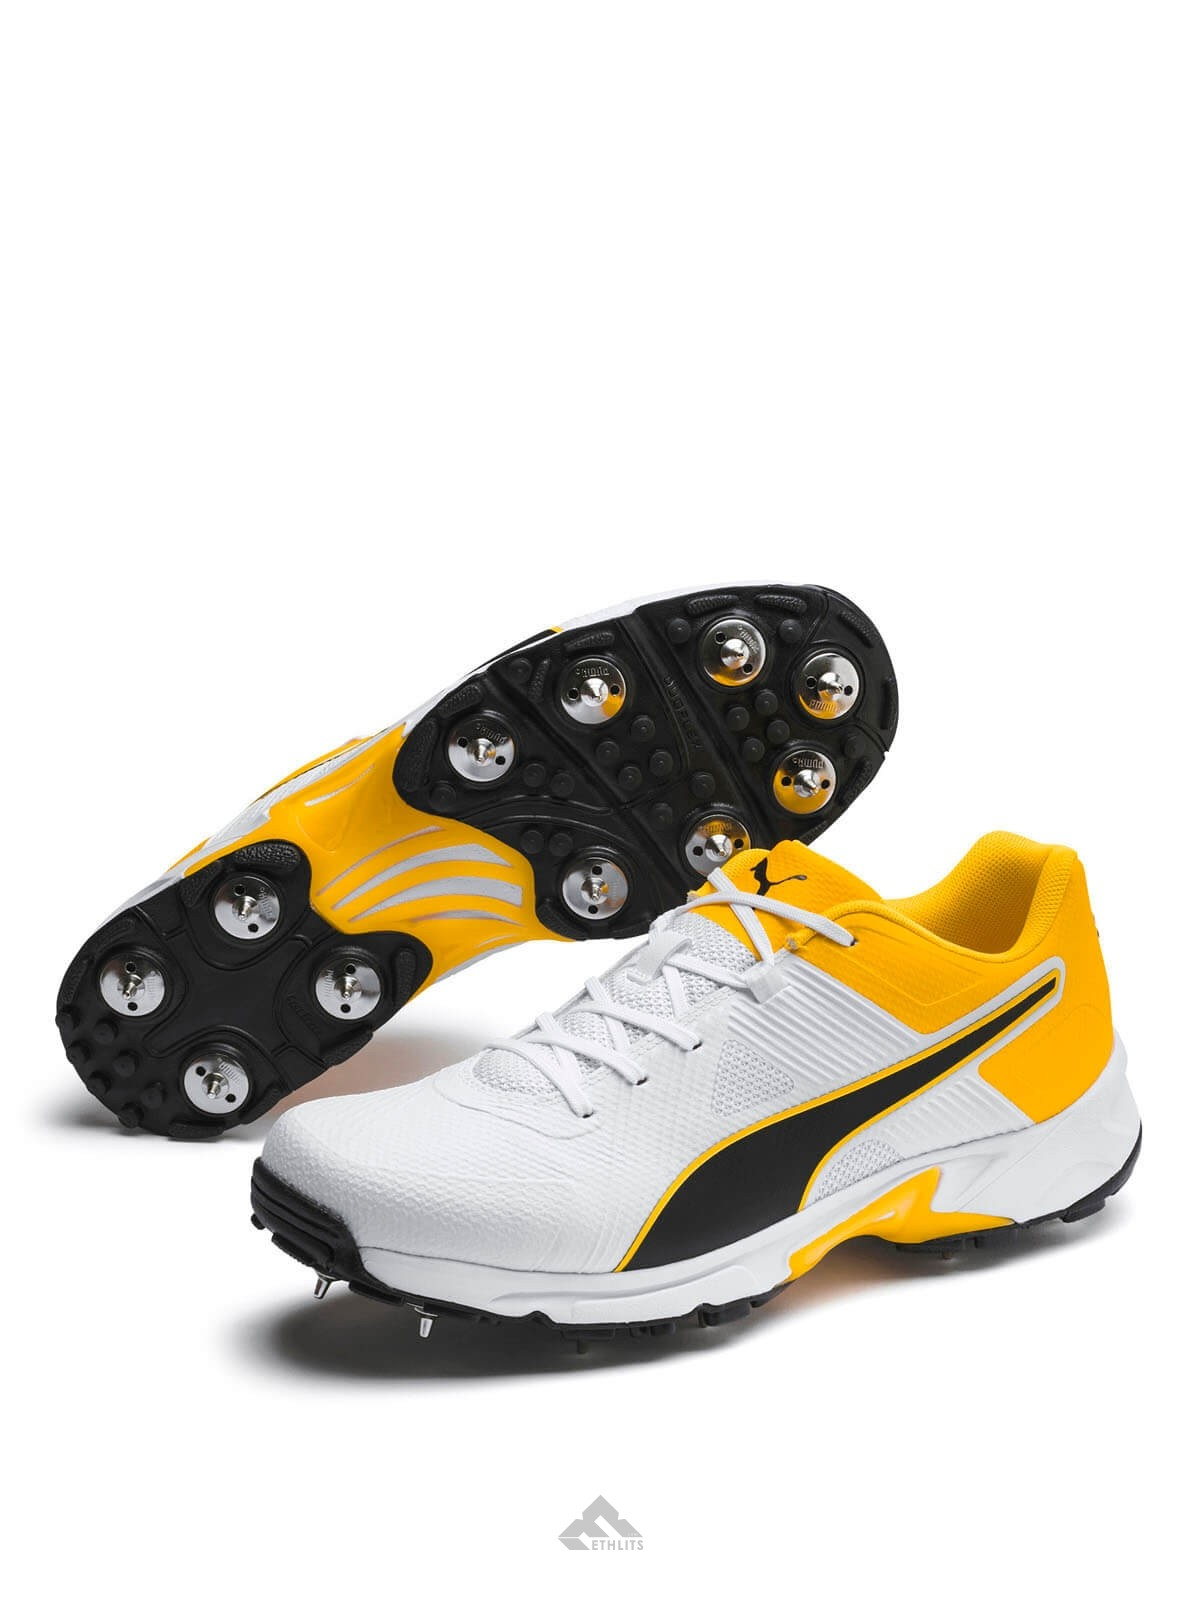 Buy Puma 19.2 Spike Orange/White Men's